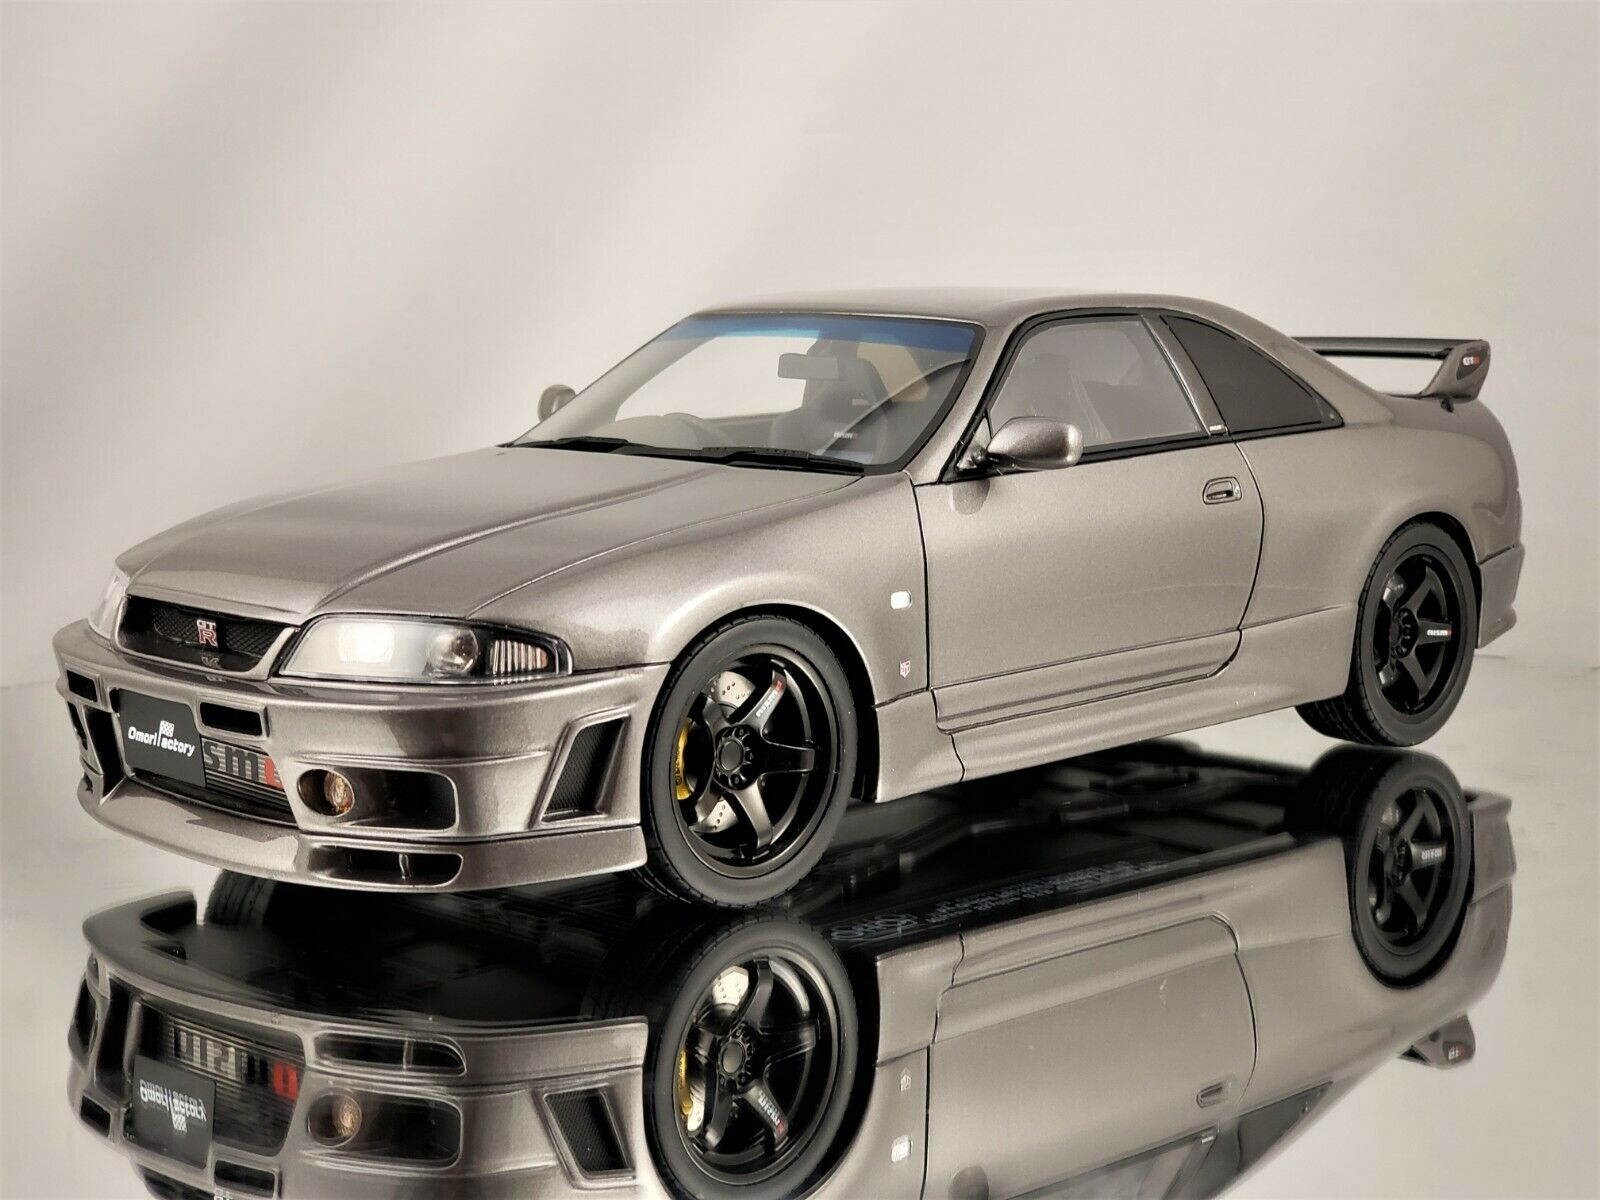 Otto Mobile Nissan Skyline GT-R R33 Grand Touring Omori fábrica exclusivamente 33 grigio 1 18